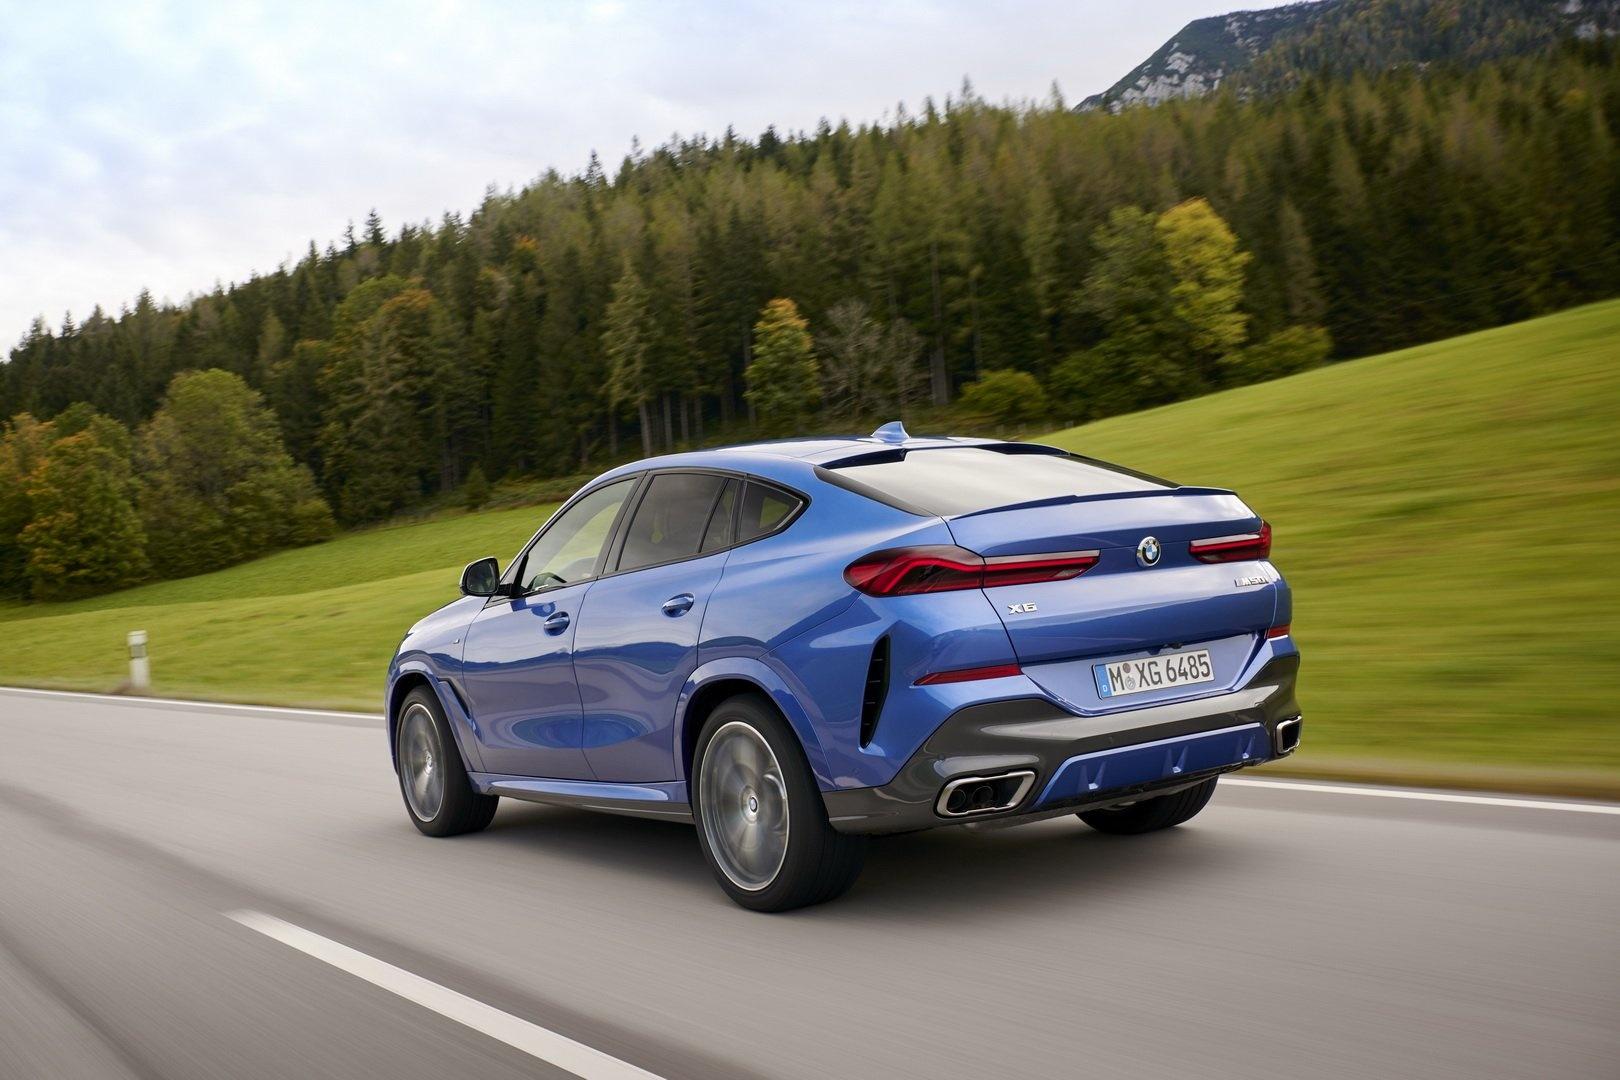 BMW X6 2020 - SUV voi suc manh sieu xe hinh anh 5